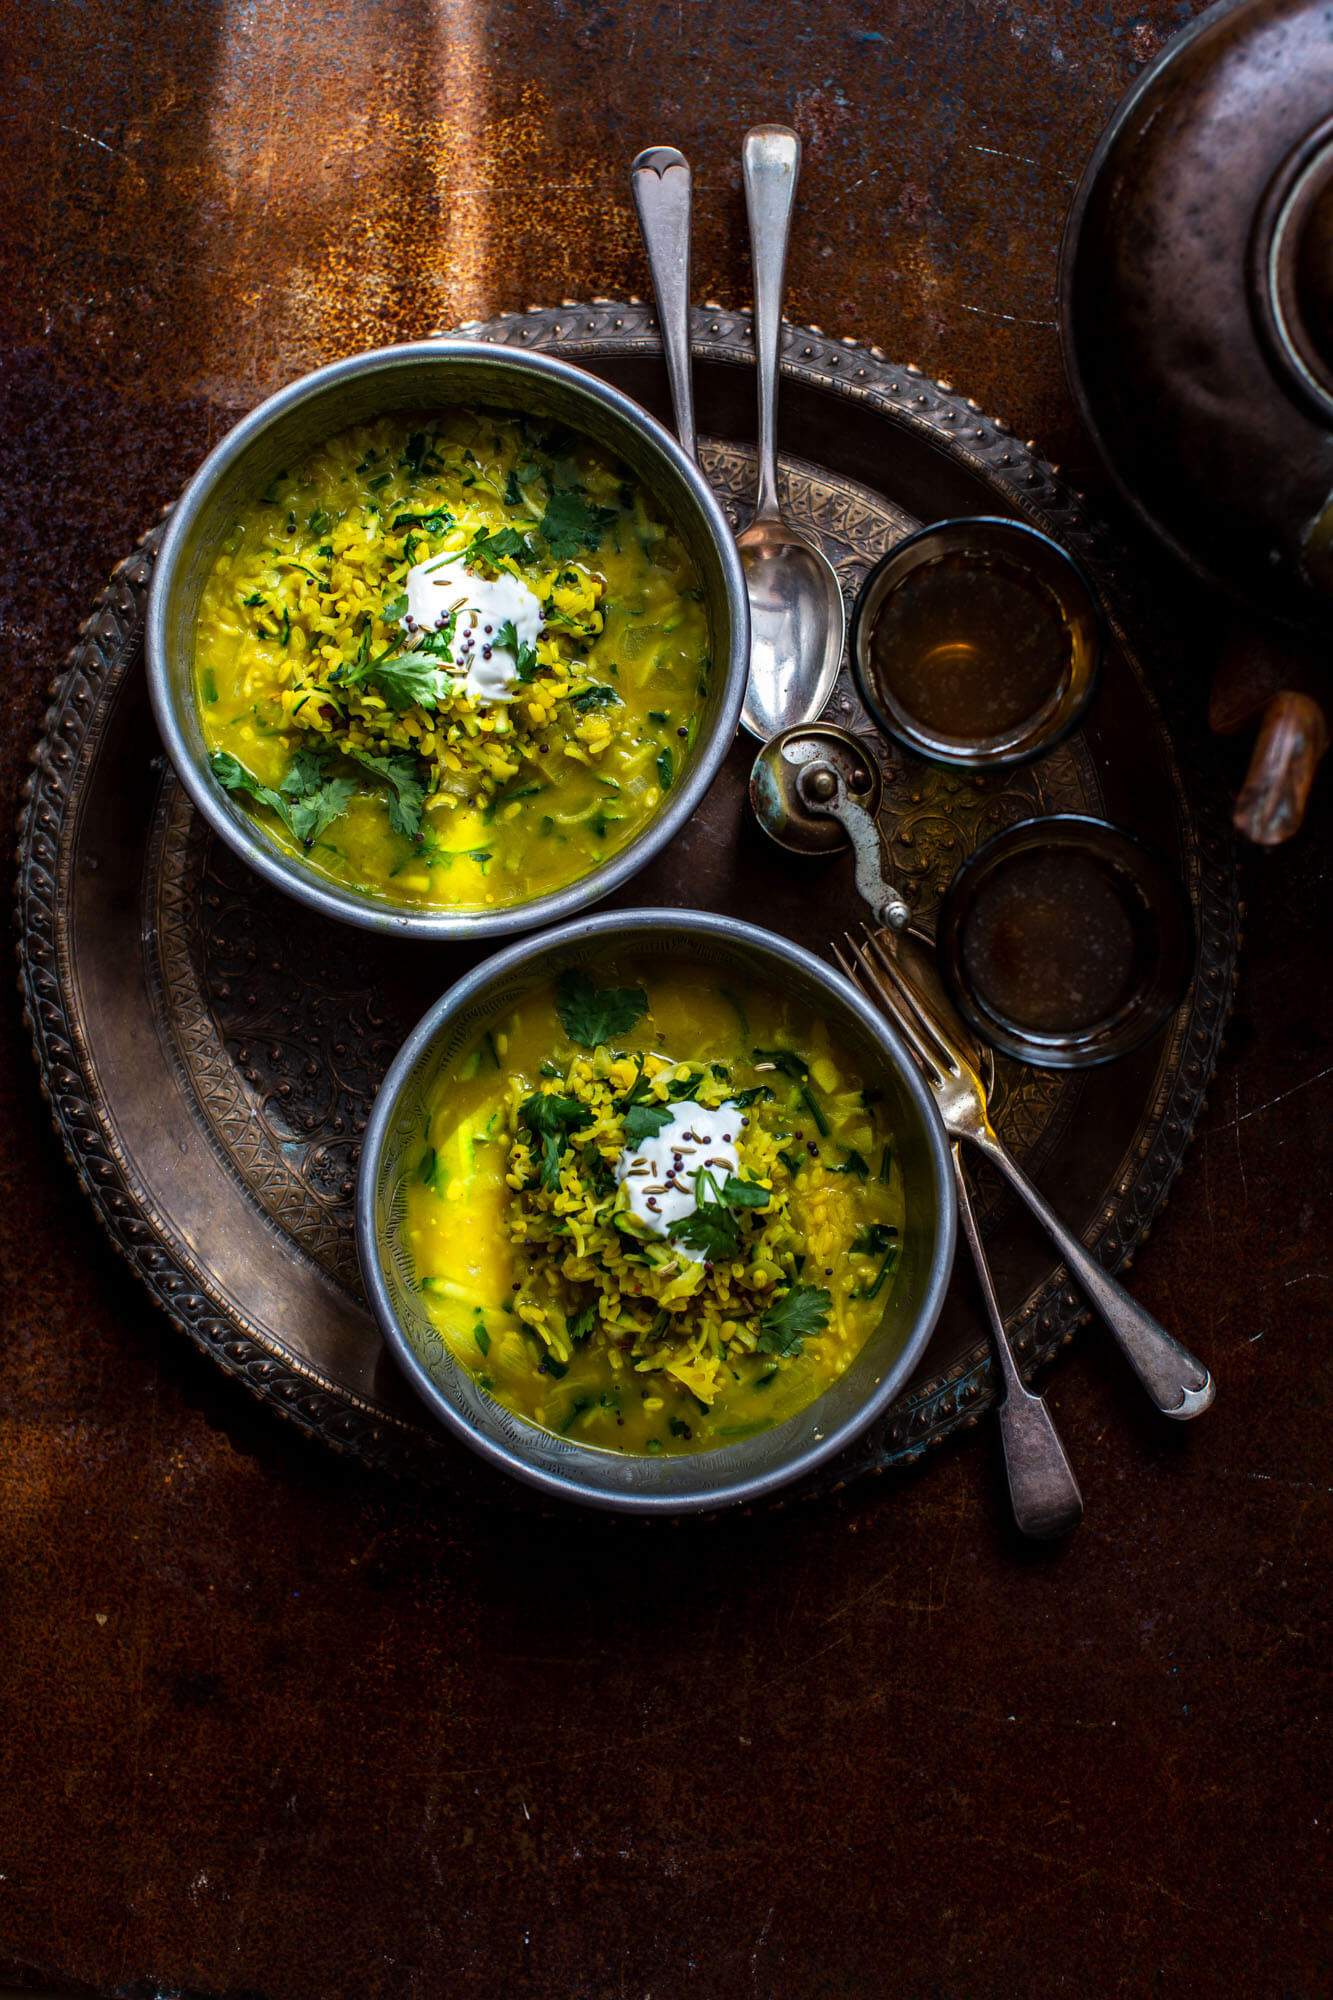 Indian food - Food photography-Dorset